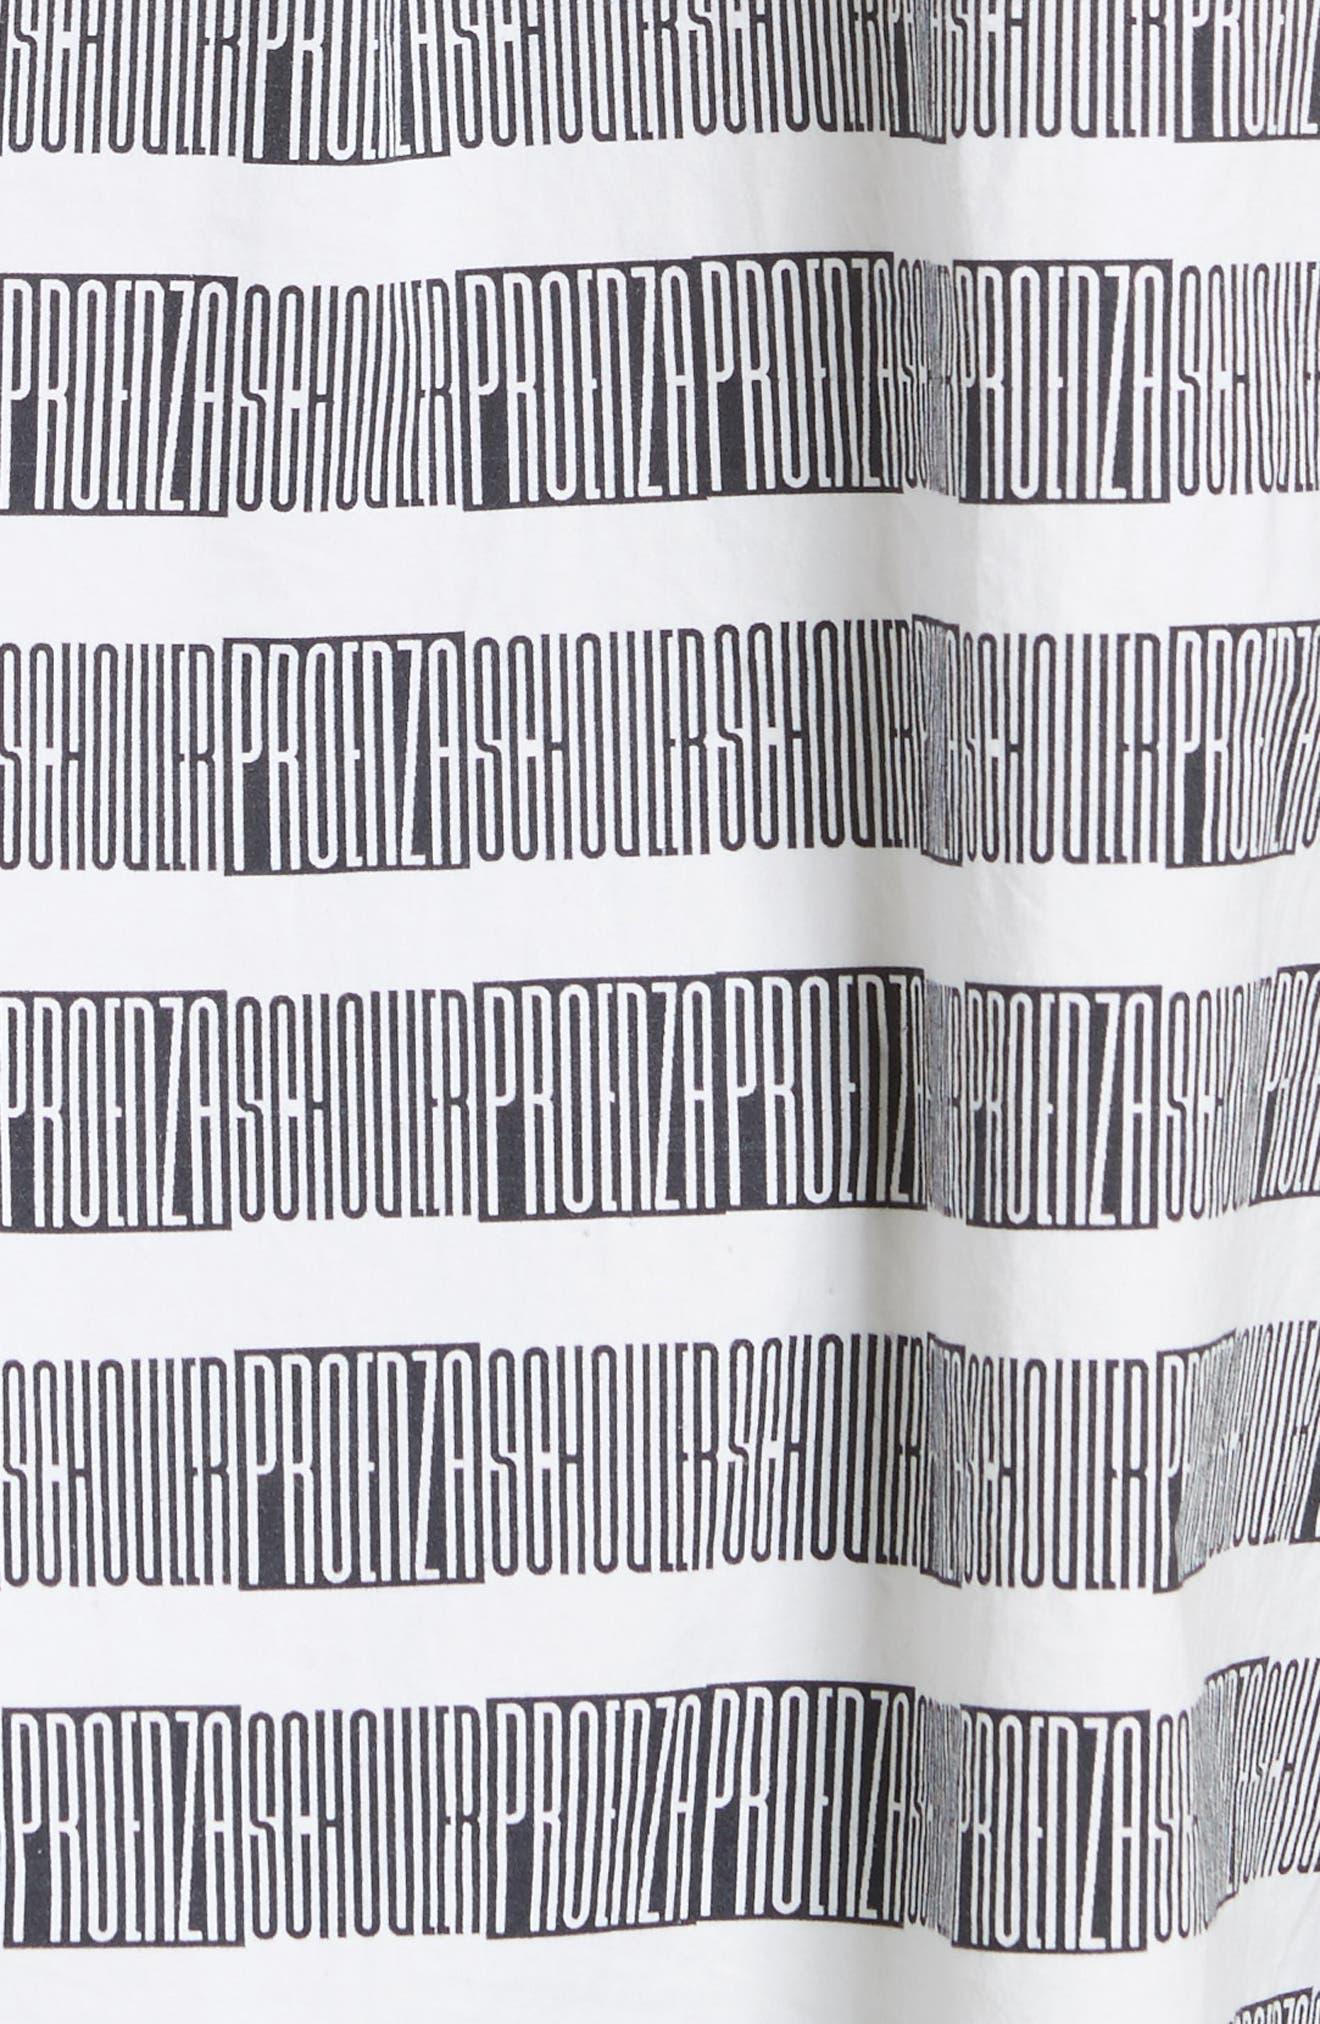 PSWL Graphic Stripe Cotton Top,                             Alternate thumbnail 5, color,                             001